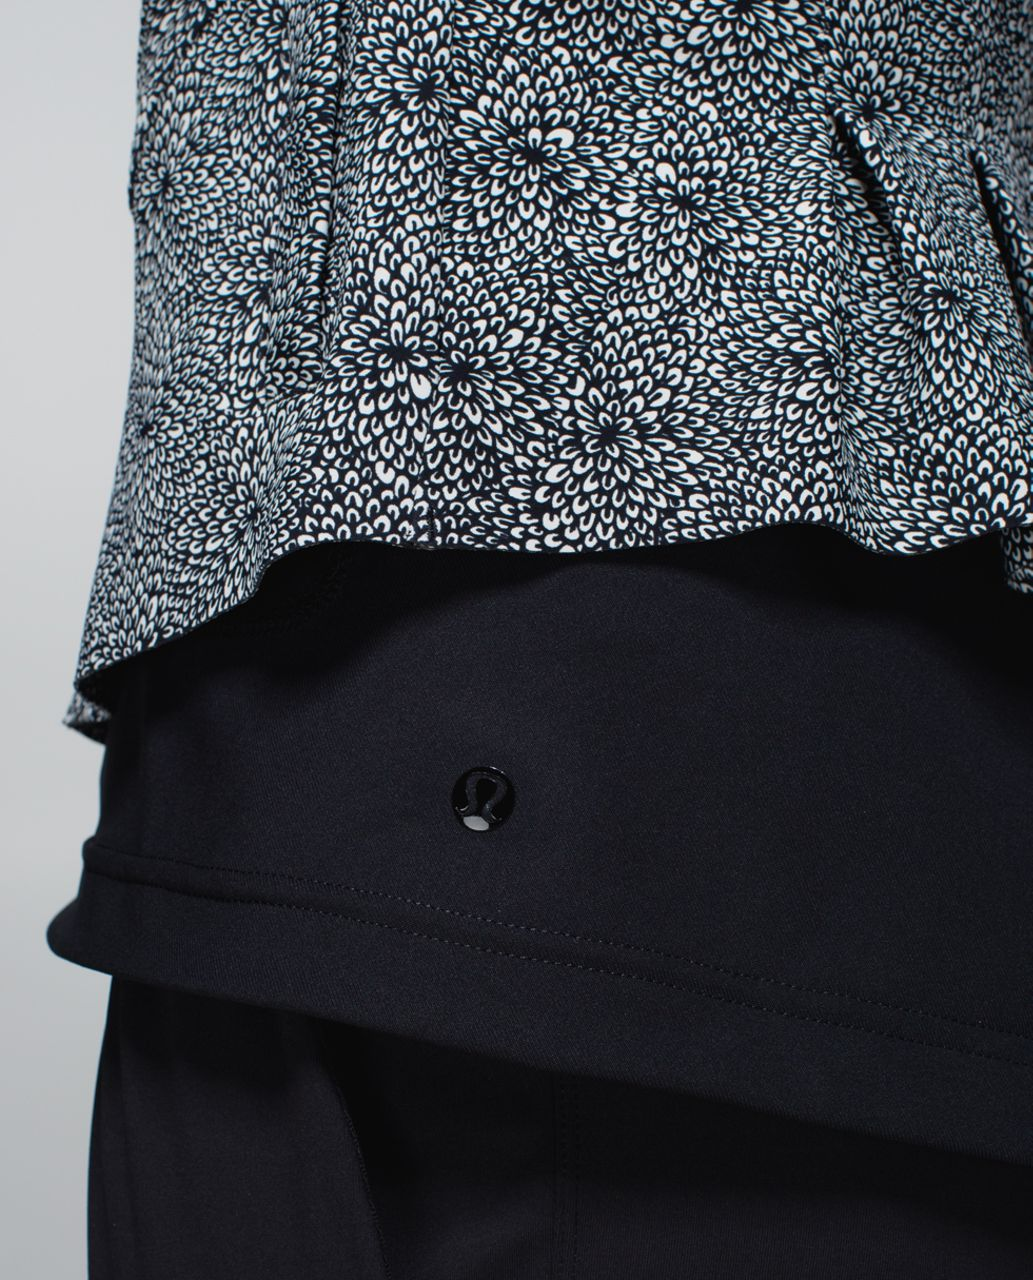 Lululemon Bust A Move Jacket - Plush Petal Black Ghost / Black / Black